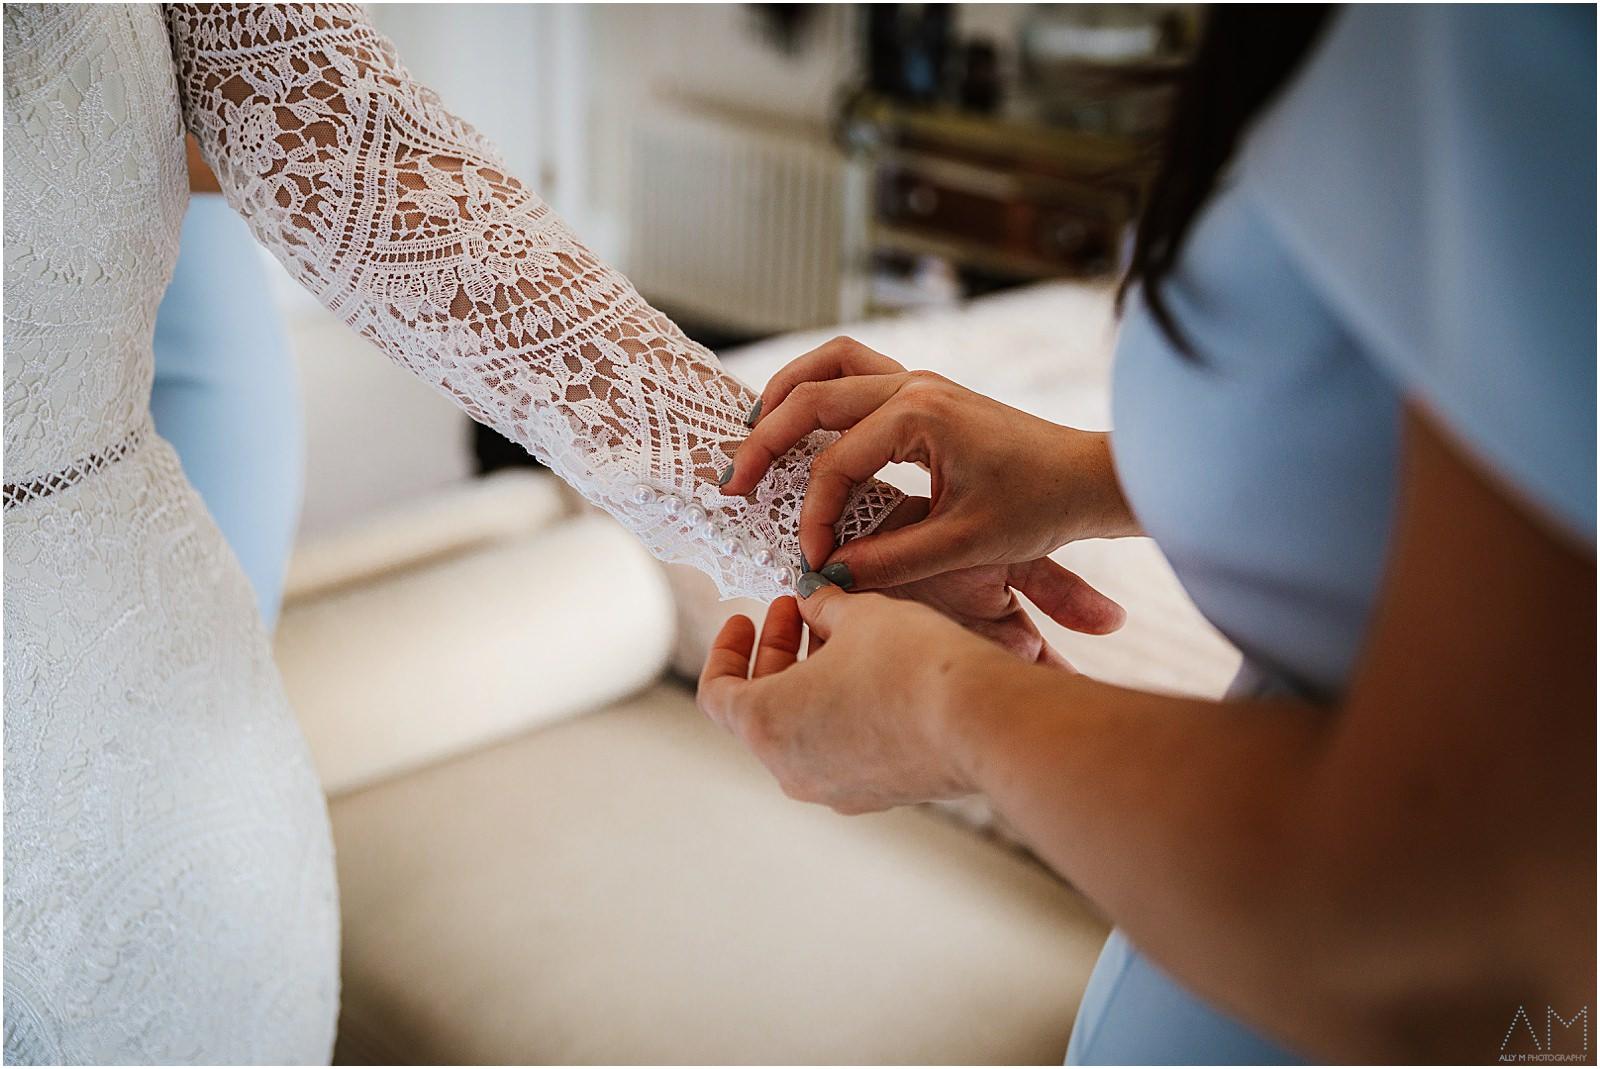 Bridesmaid helping bride with sleeve